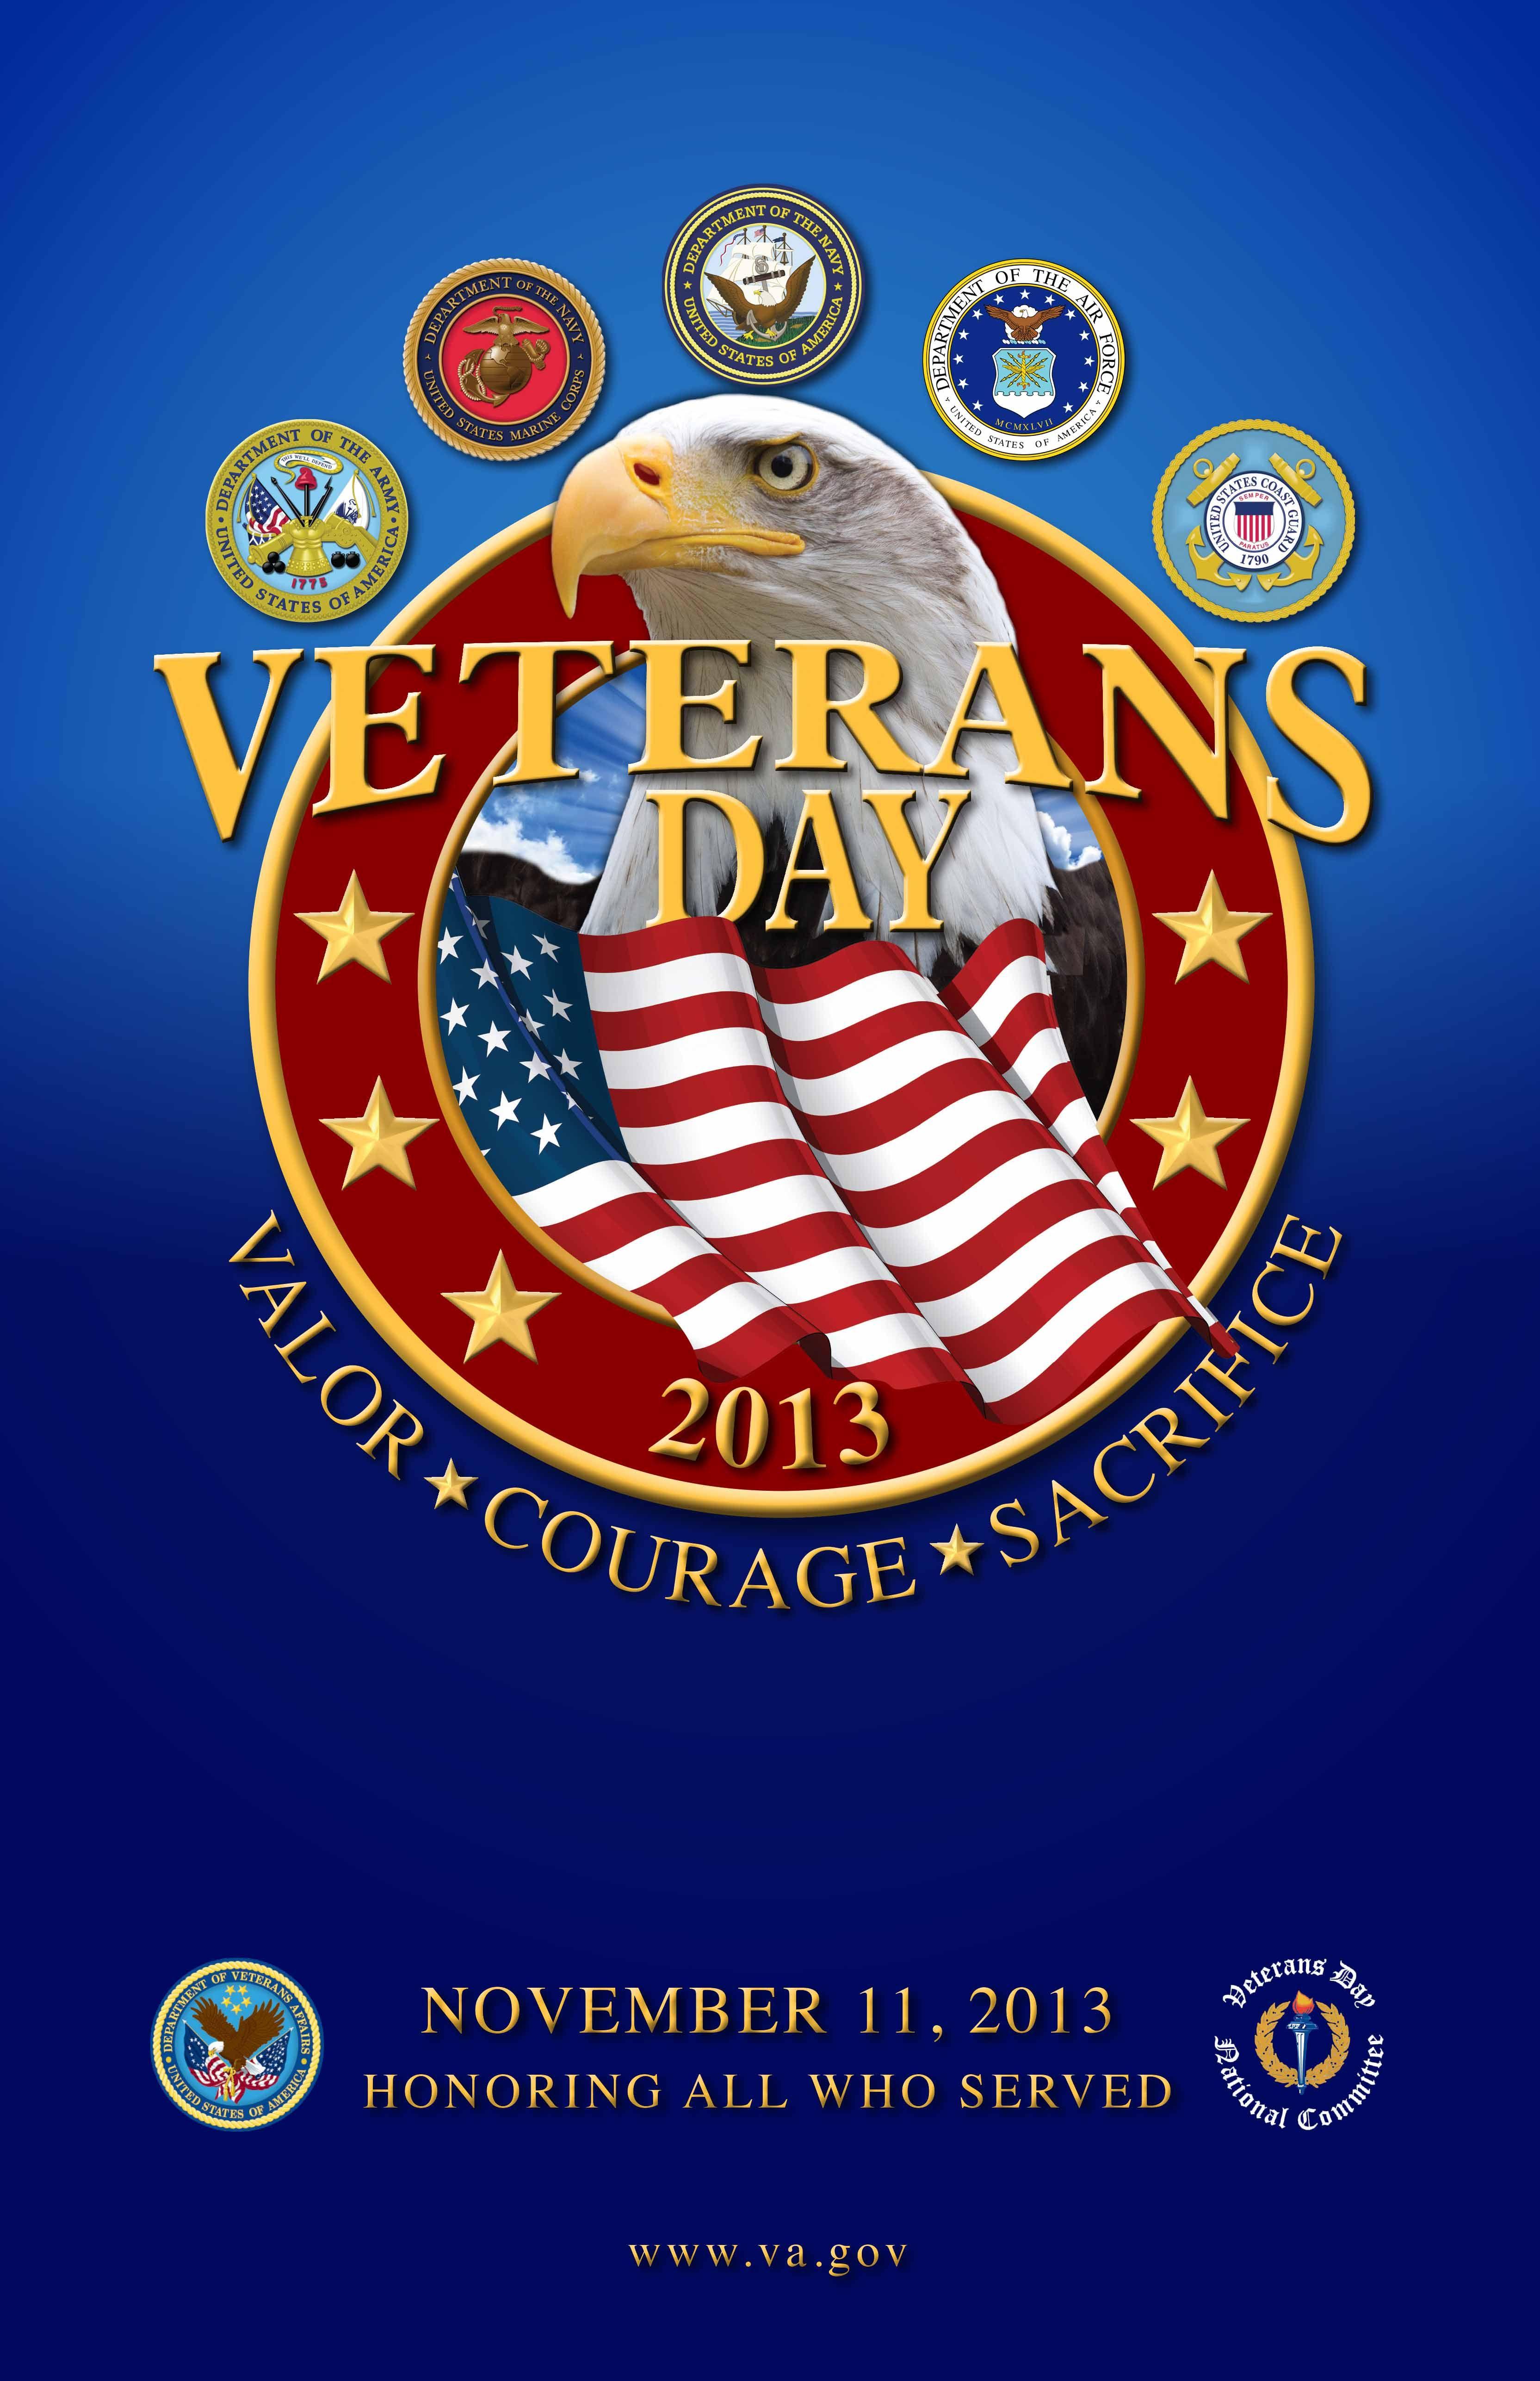 Veterans Day Wallpaper